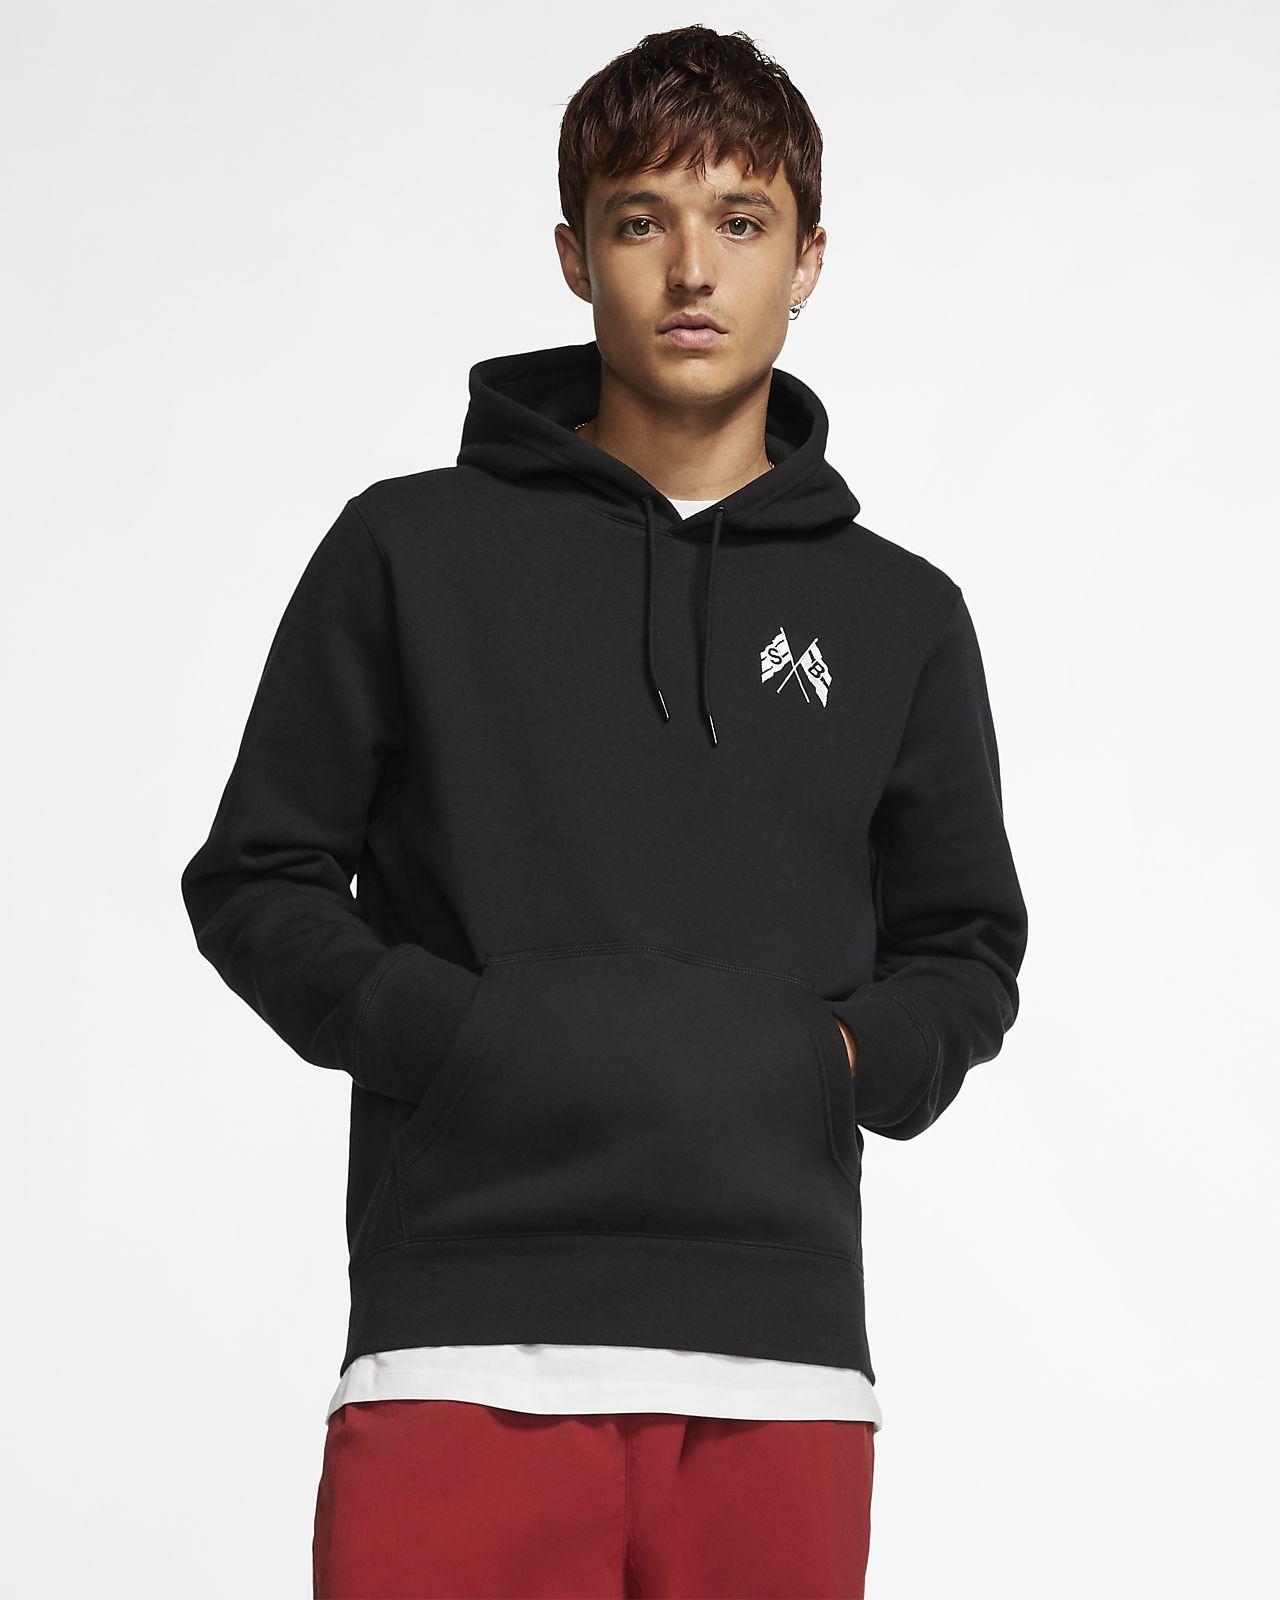 sale retailer 98d4e 2380a Felpa pullover da skateboard a manica lunga con cappuccio Nike SB - Uomo